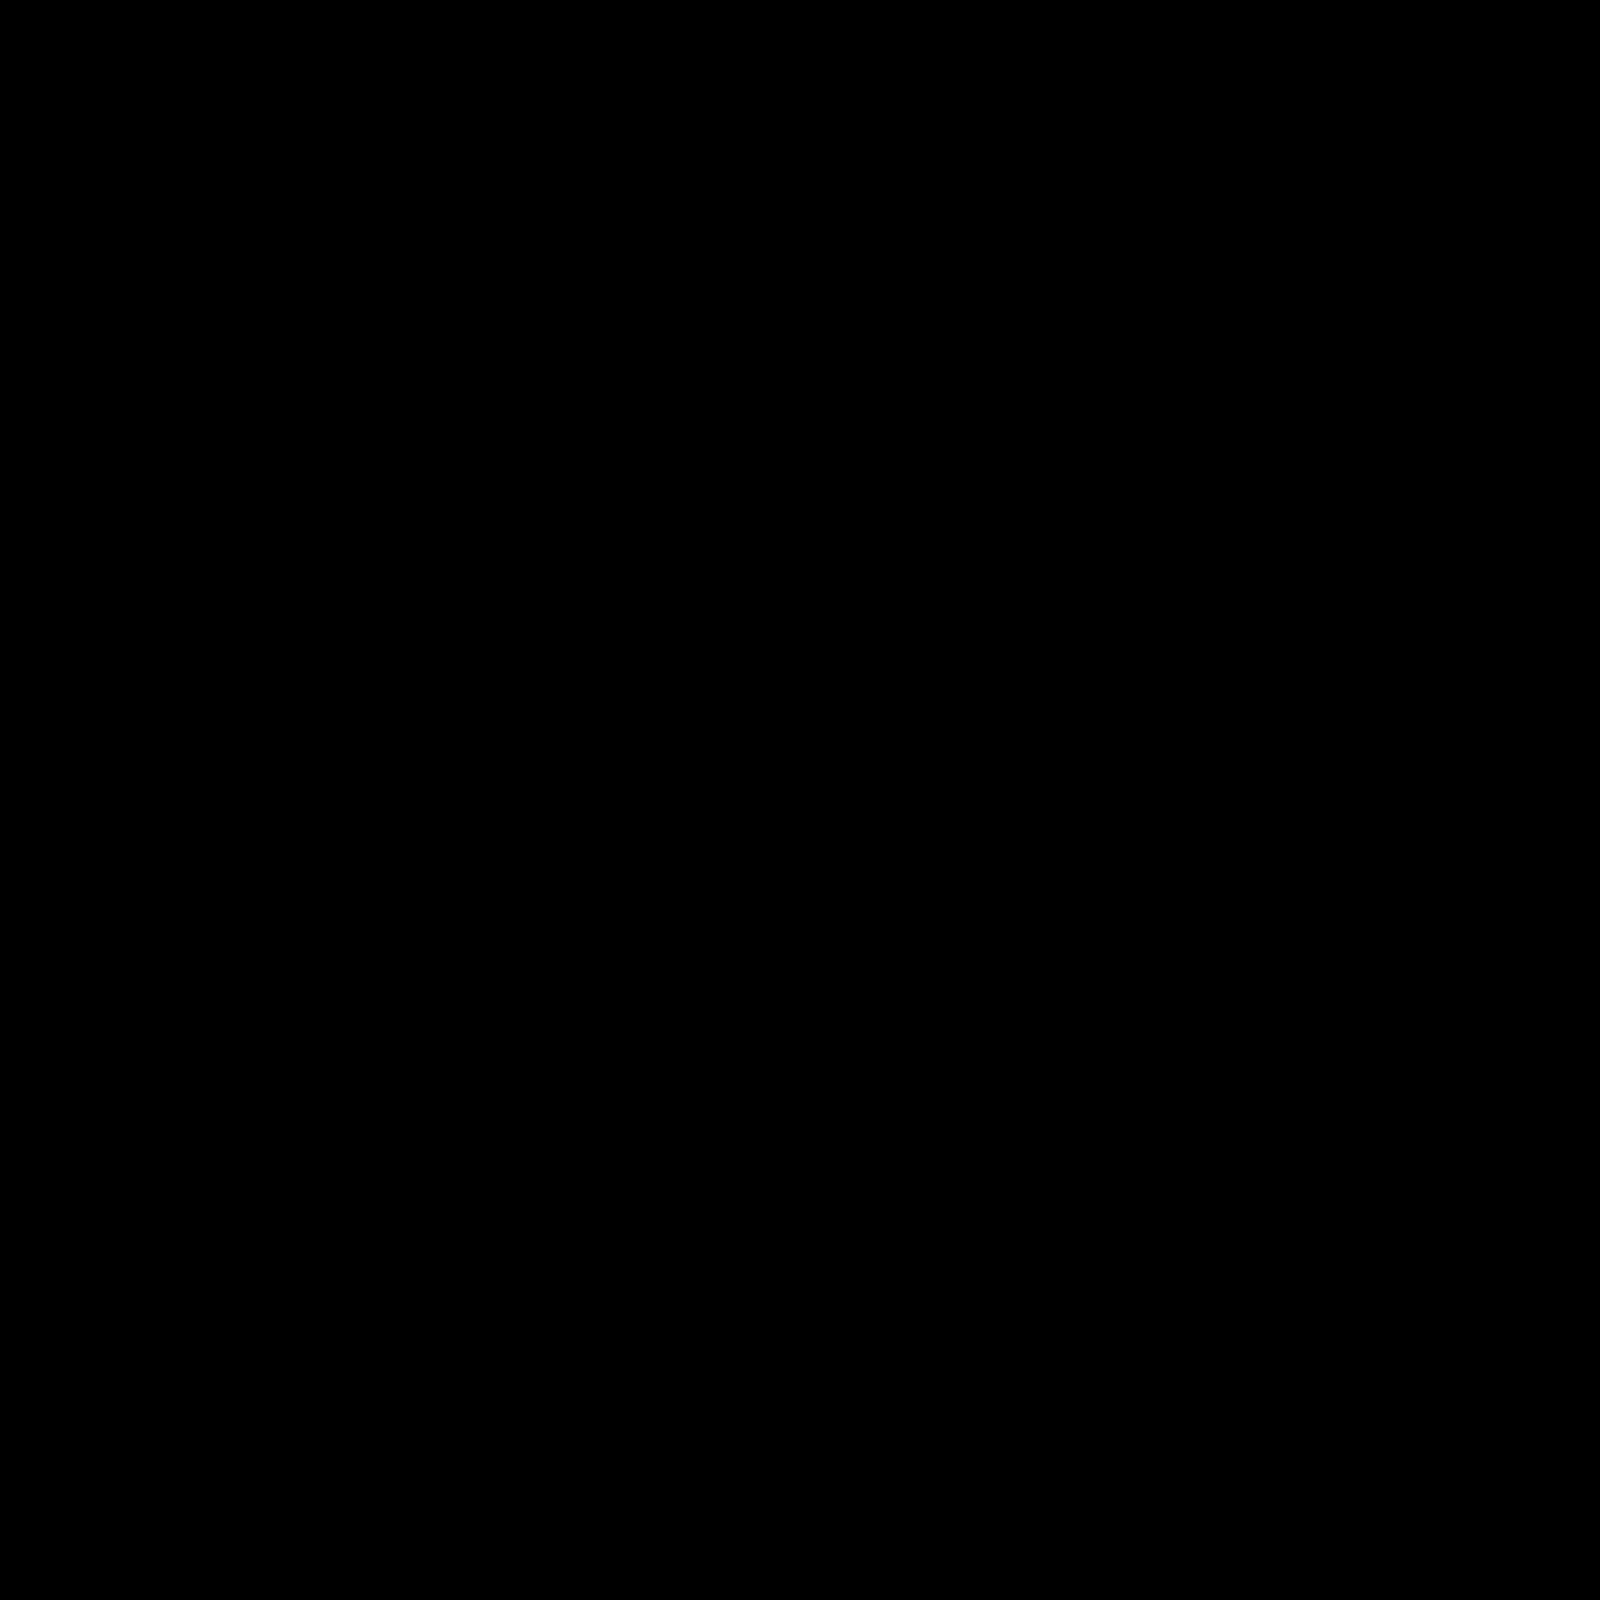 camera-clip-art-black-and-white-15-transparent